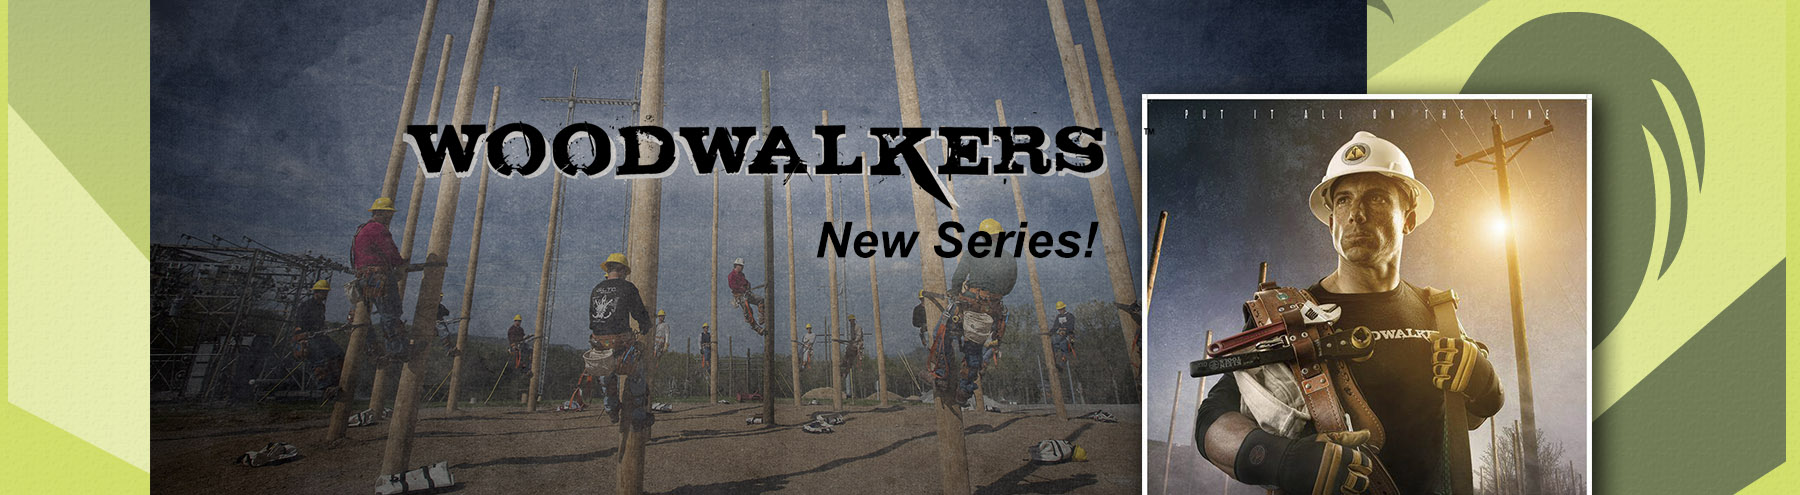 Woodwalkers banner